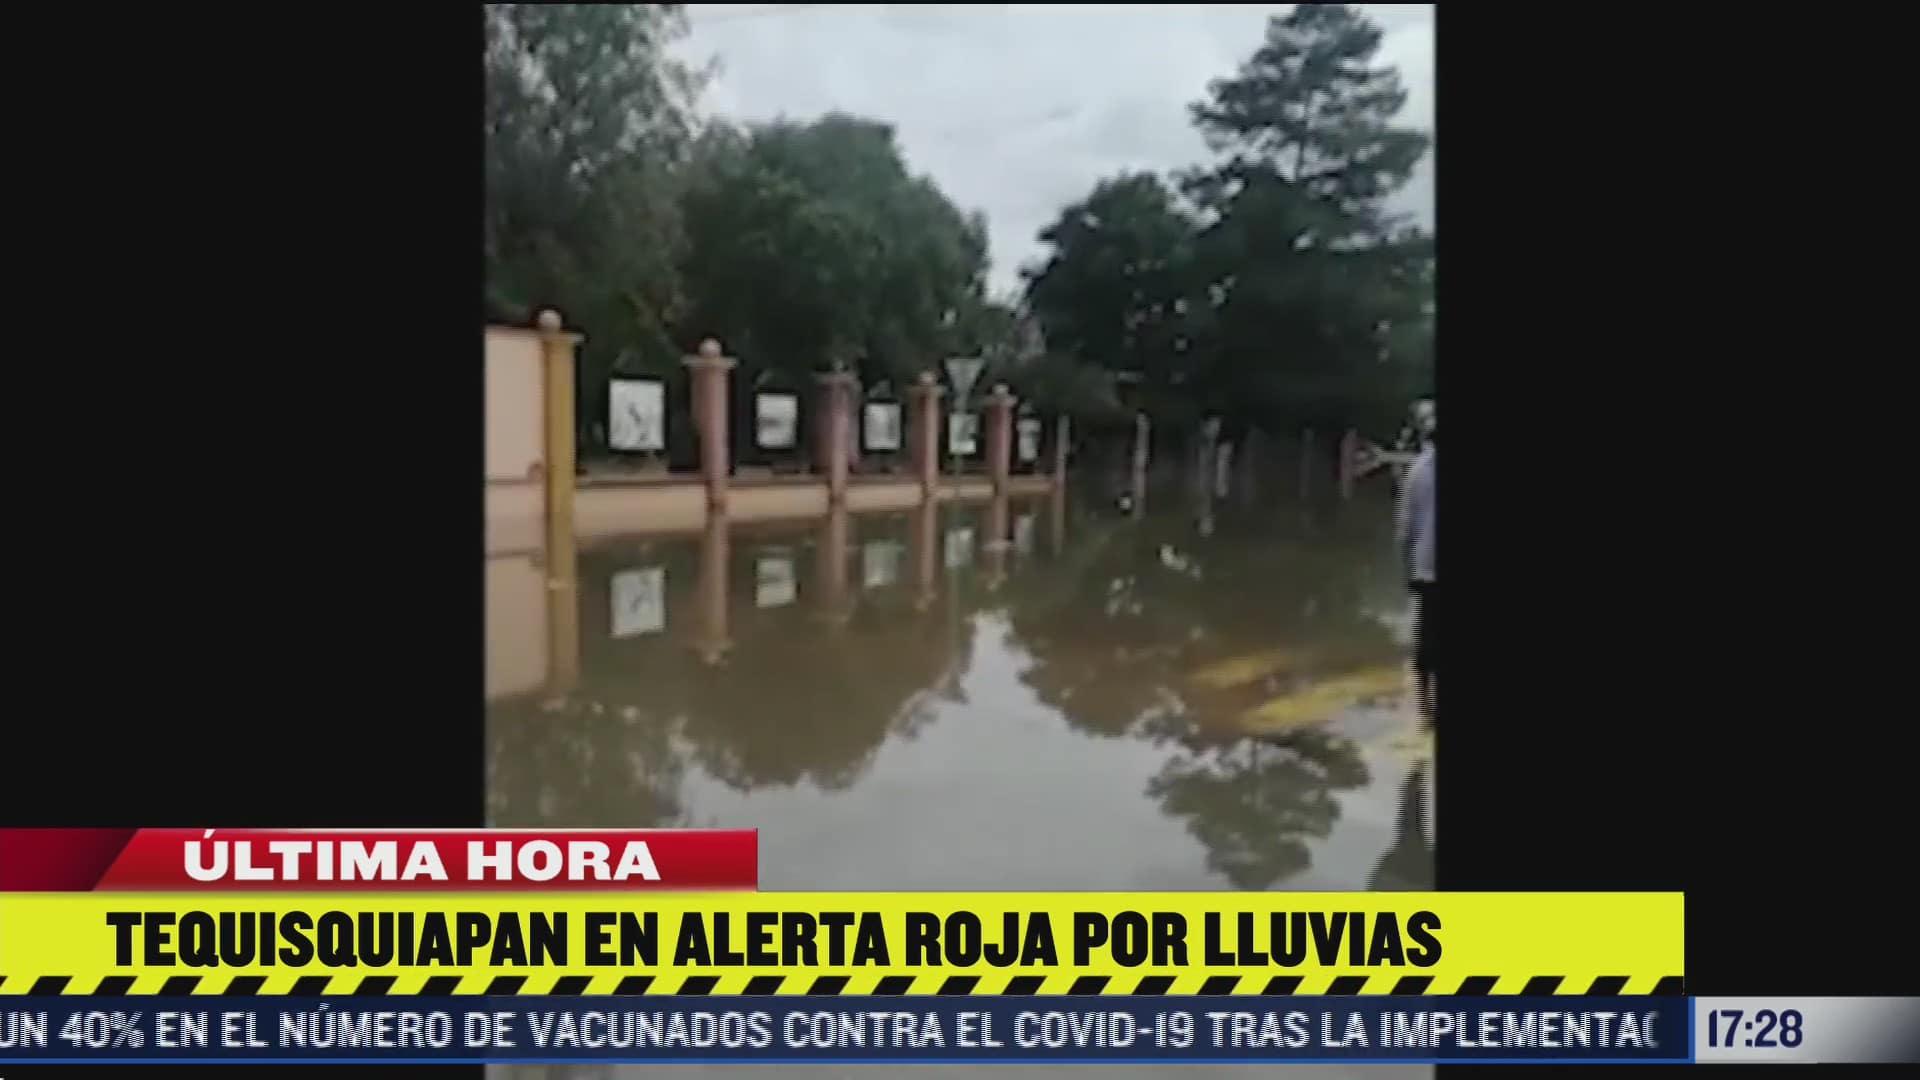 tequisquiapan pasa al semaforo rojo tras fuertes lluvias